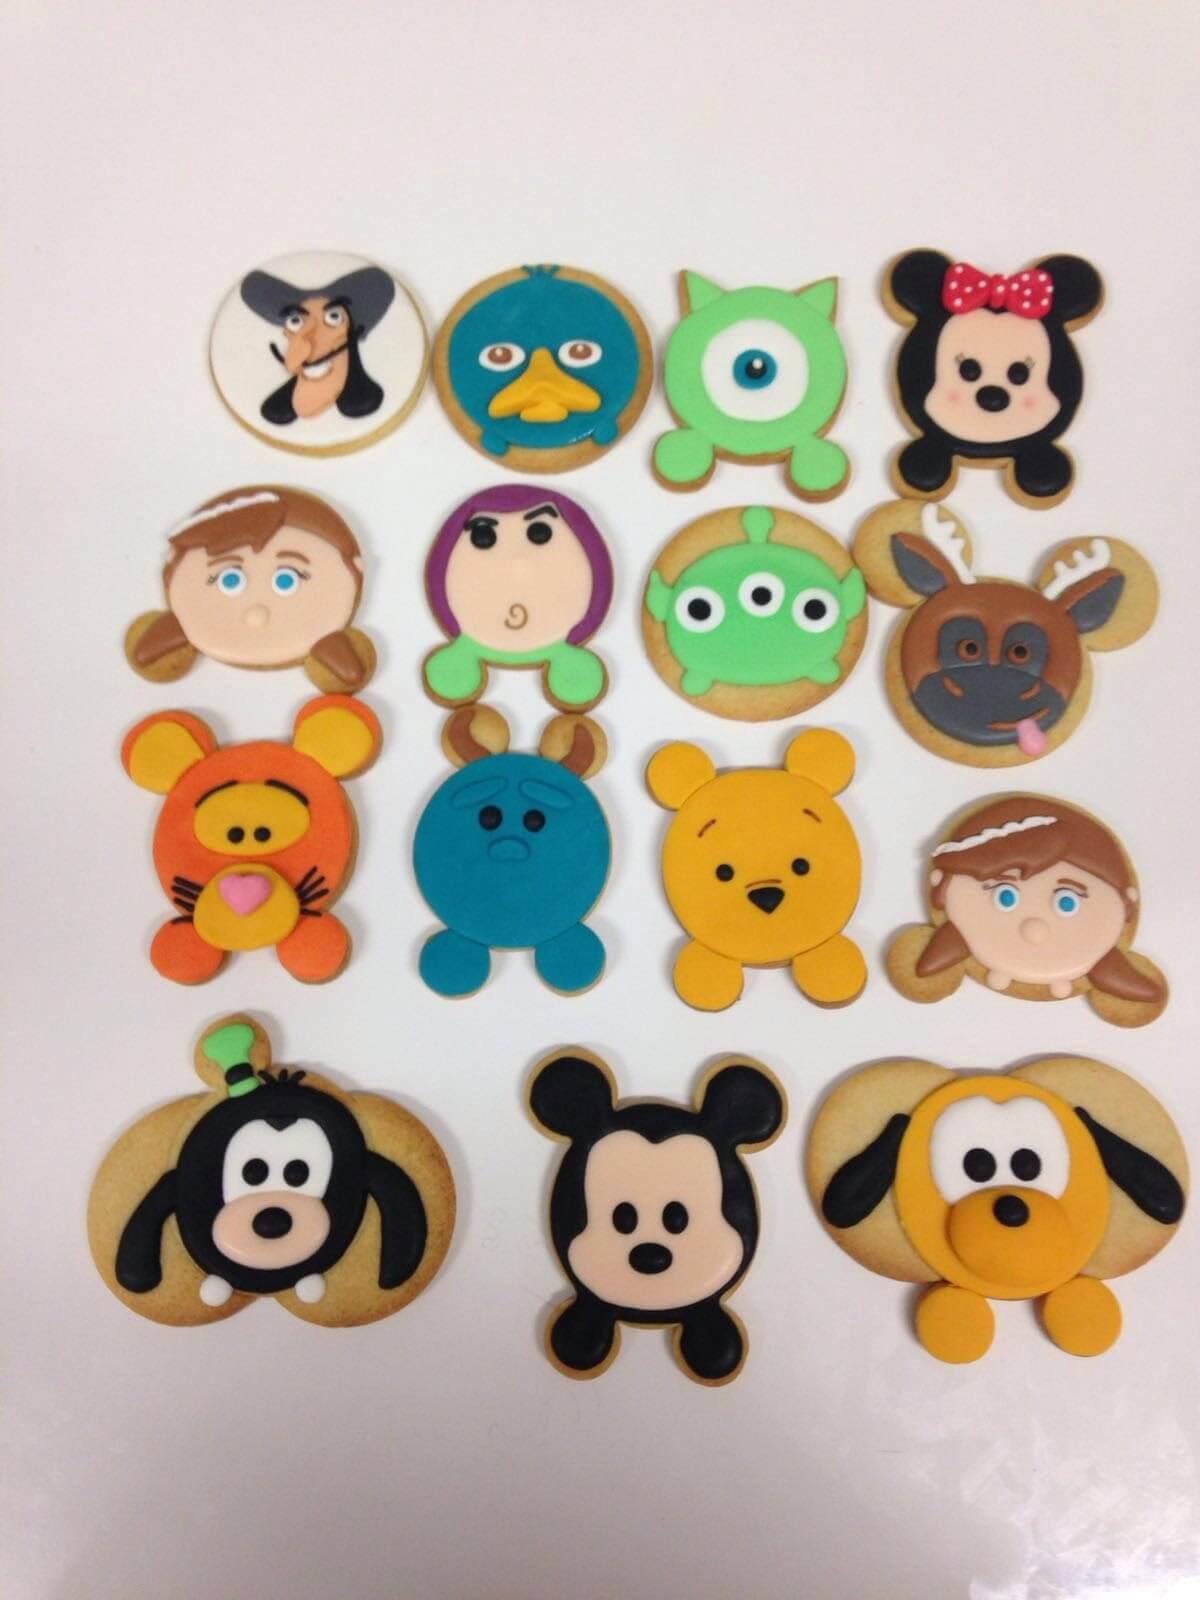 Galletas decoradas Disney Minnie Mickey  goofy pluto tiger Winnie the Poh Coruña